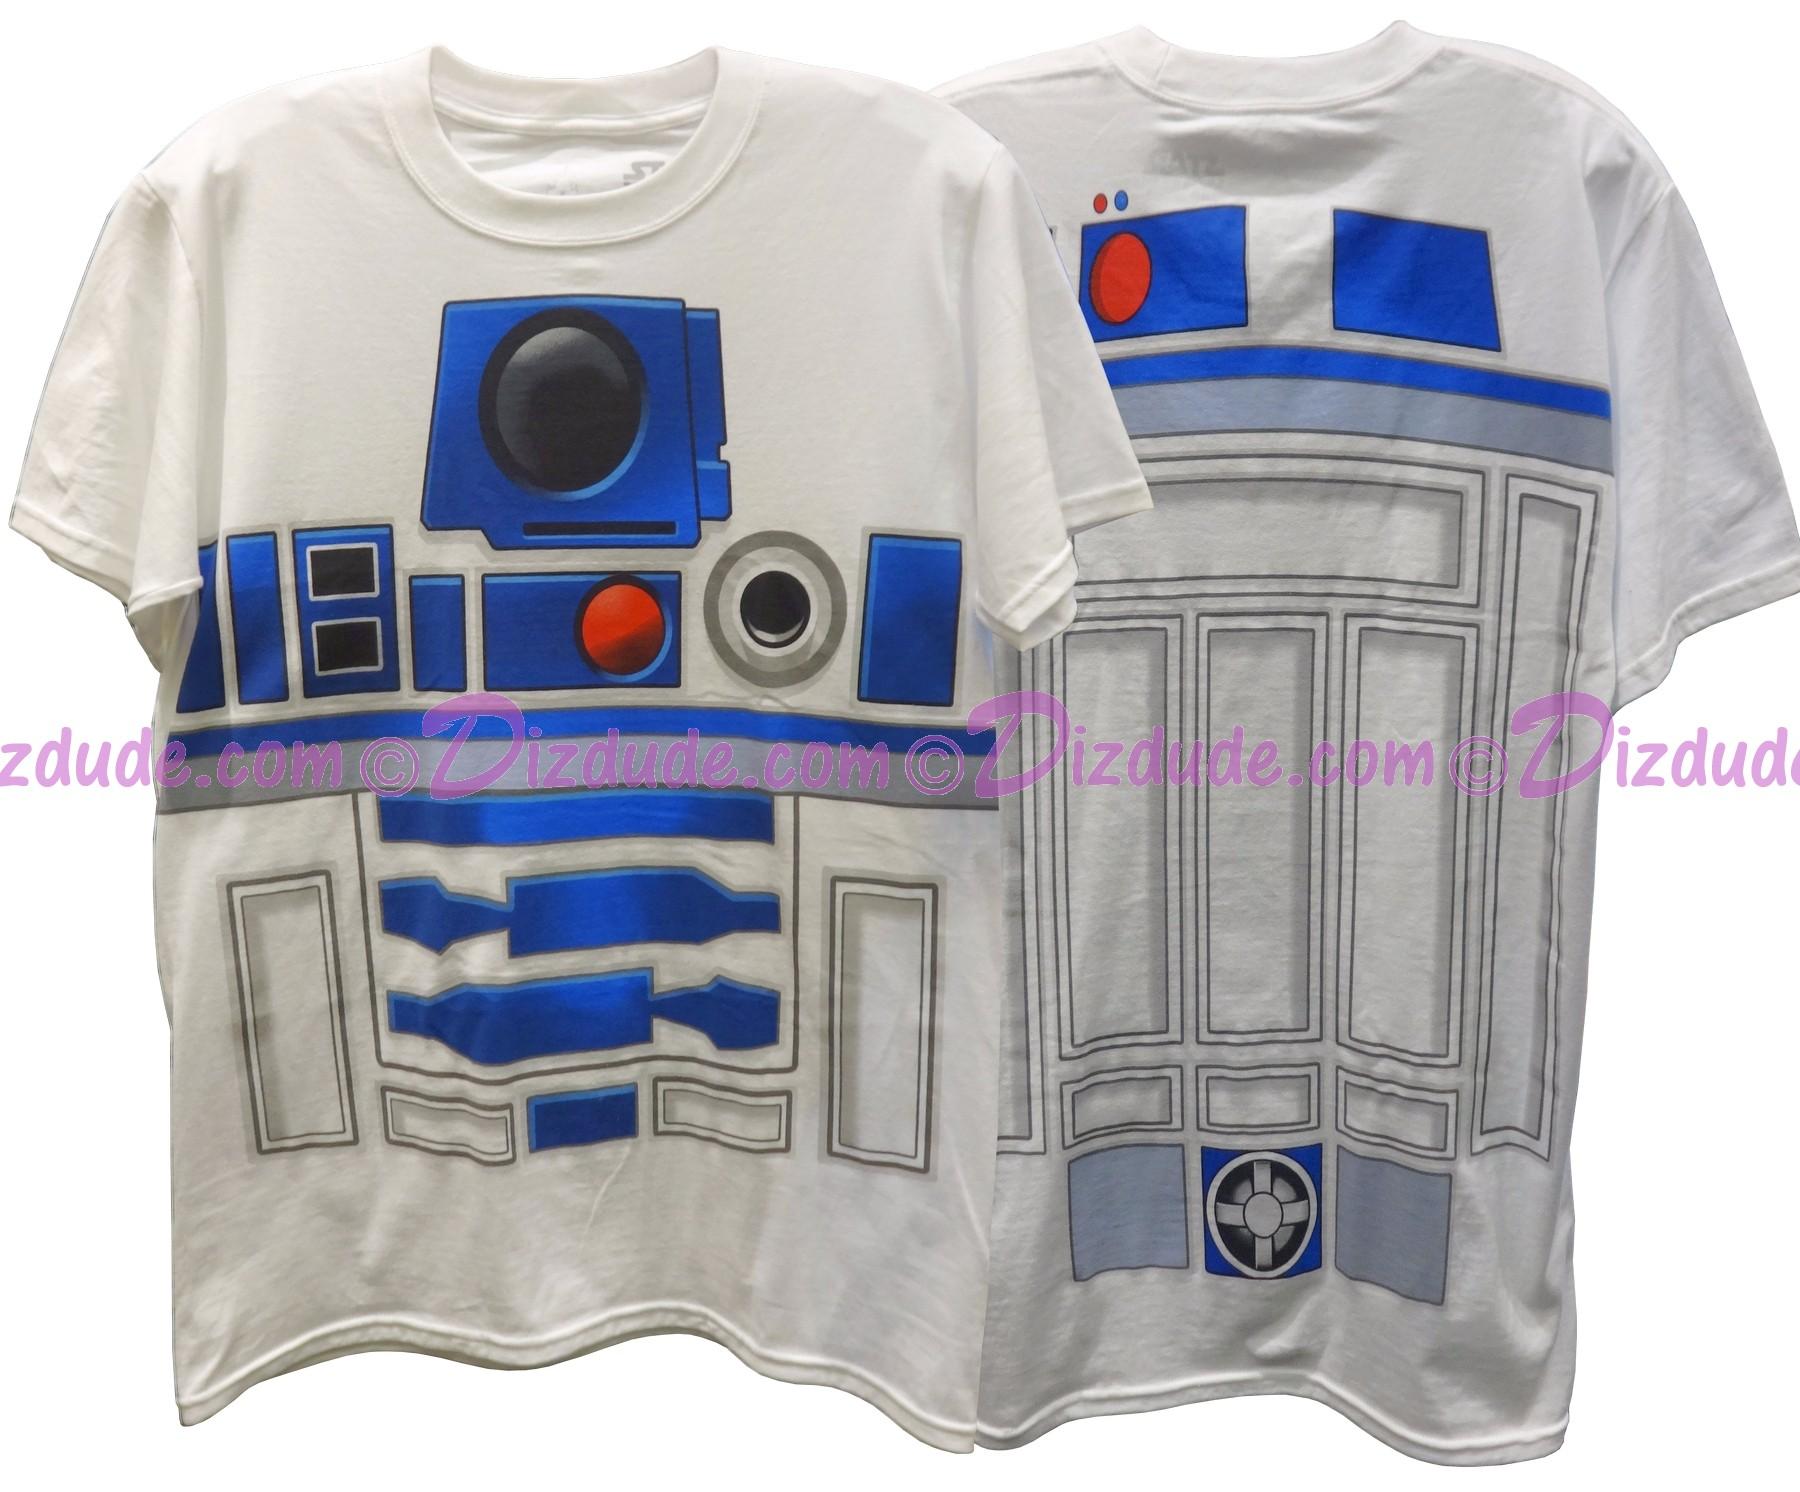 Disney Star Wars: R2-D2 Youth T-Shirt (Tshirt, T shirt or Tee) Printed Front & Back © Dizdude.com